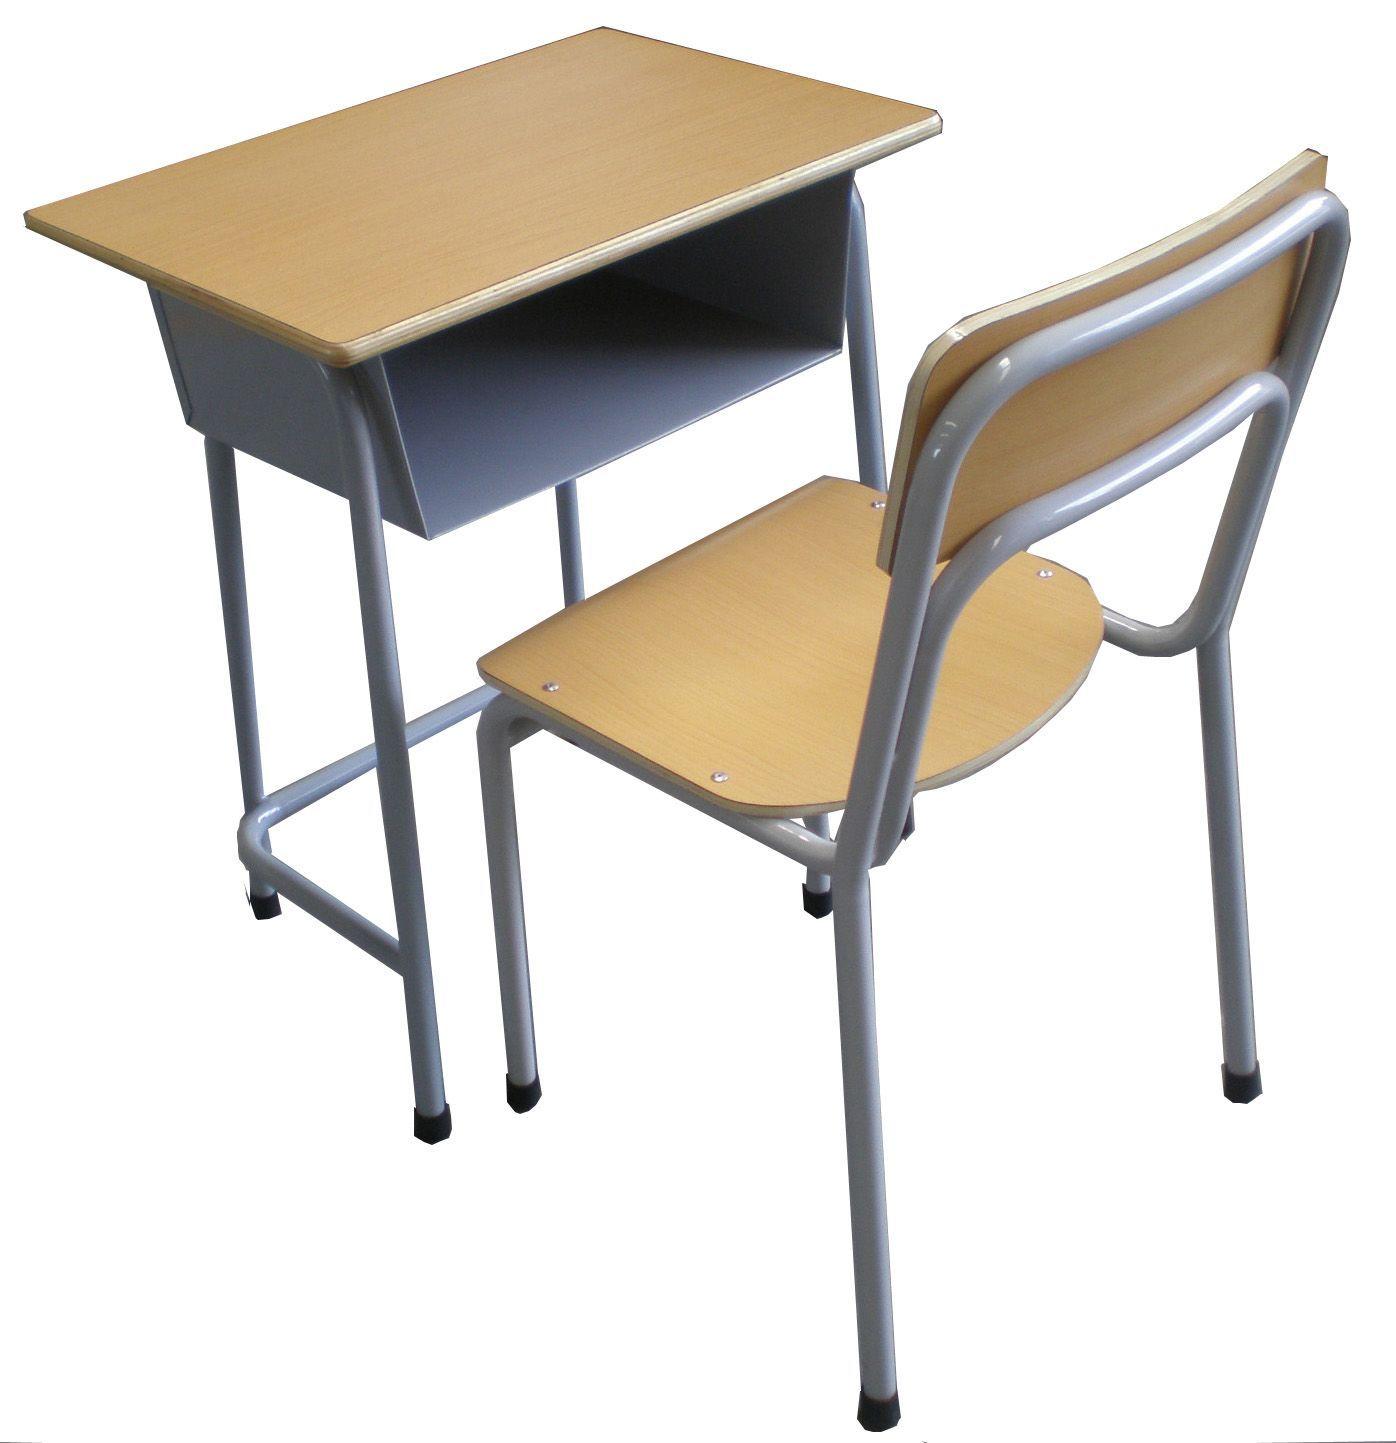 1396x1443 Desk=negative Desk Symbolizes A Barrier. Mrs. Price Put